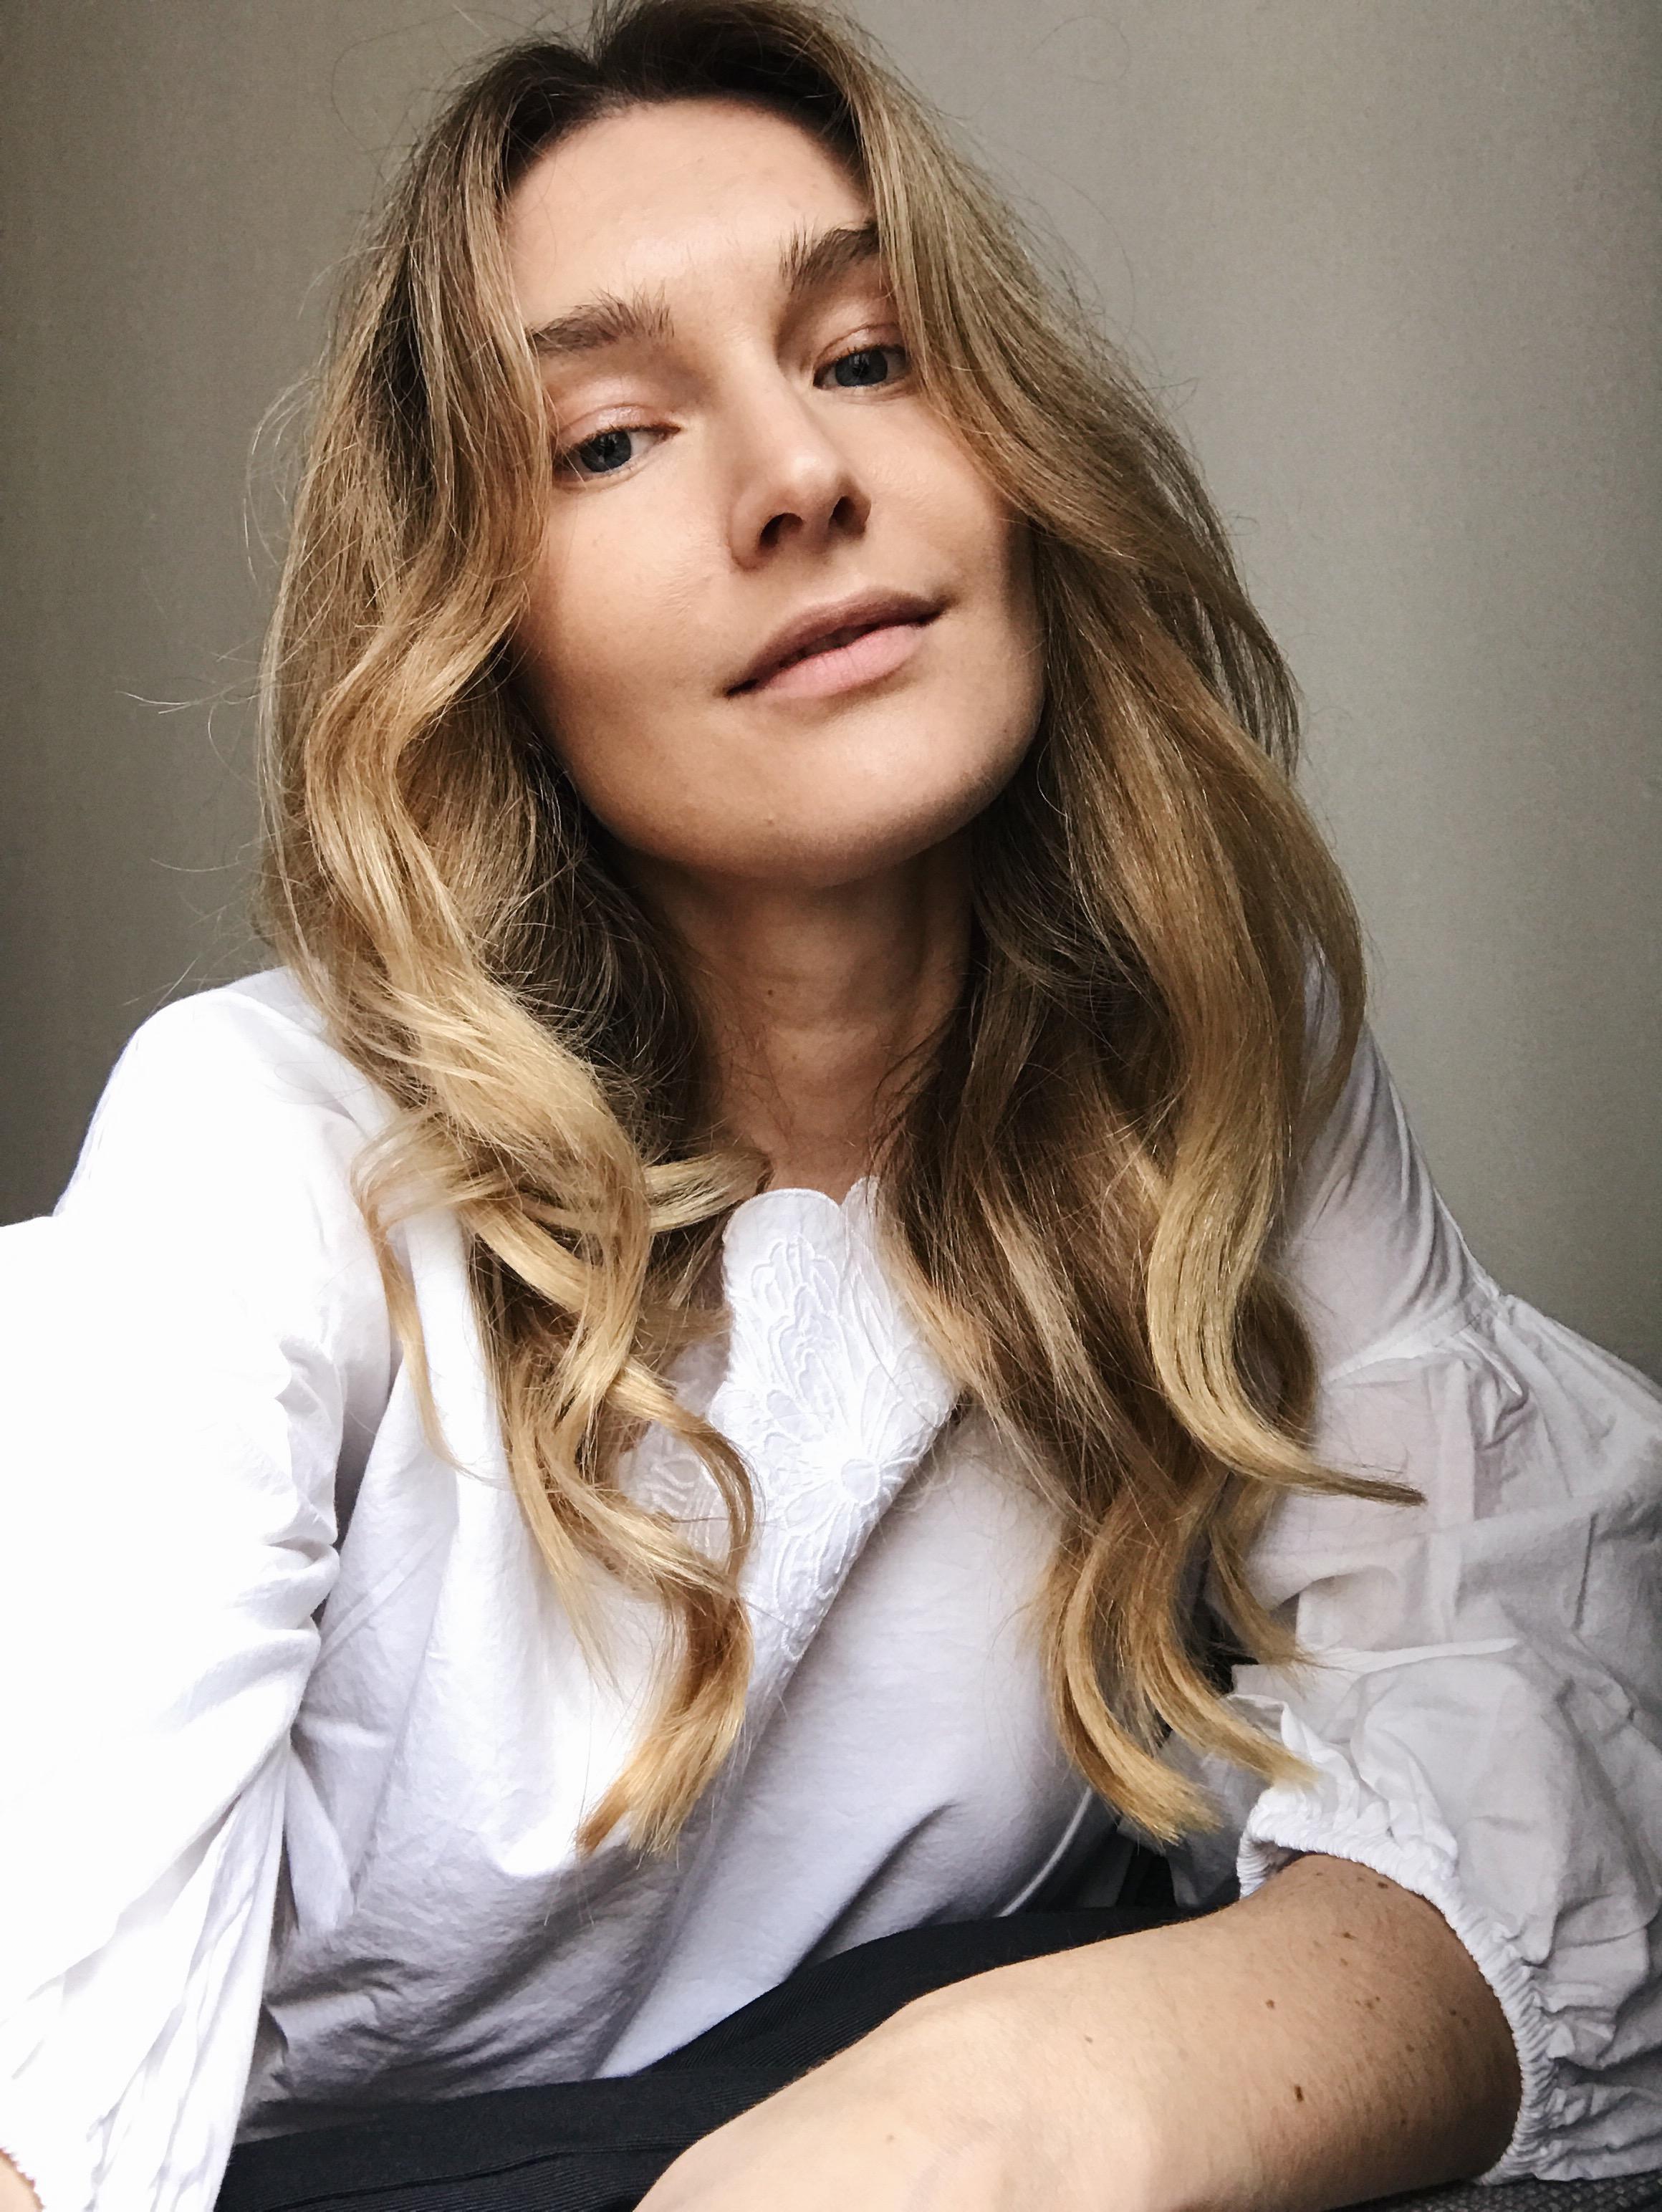 Beautyblog Beautyblogger Bare Minds Elina Neumann No Make-up